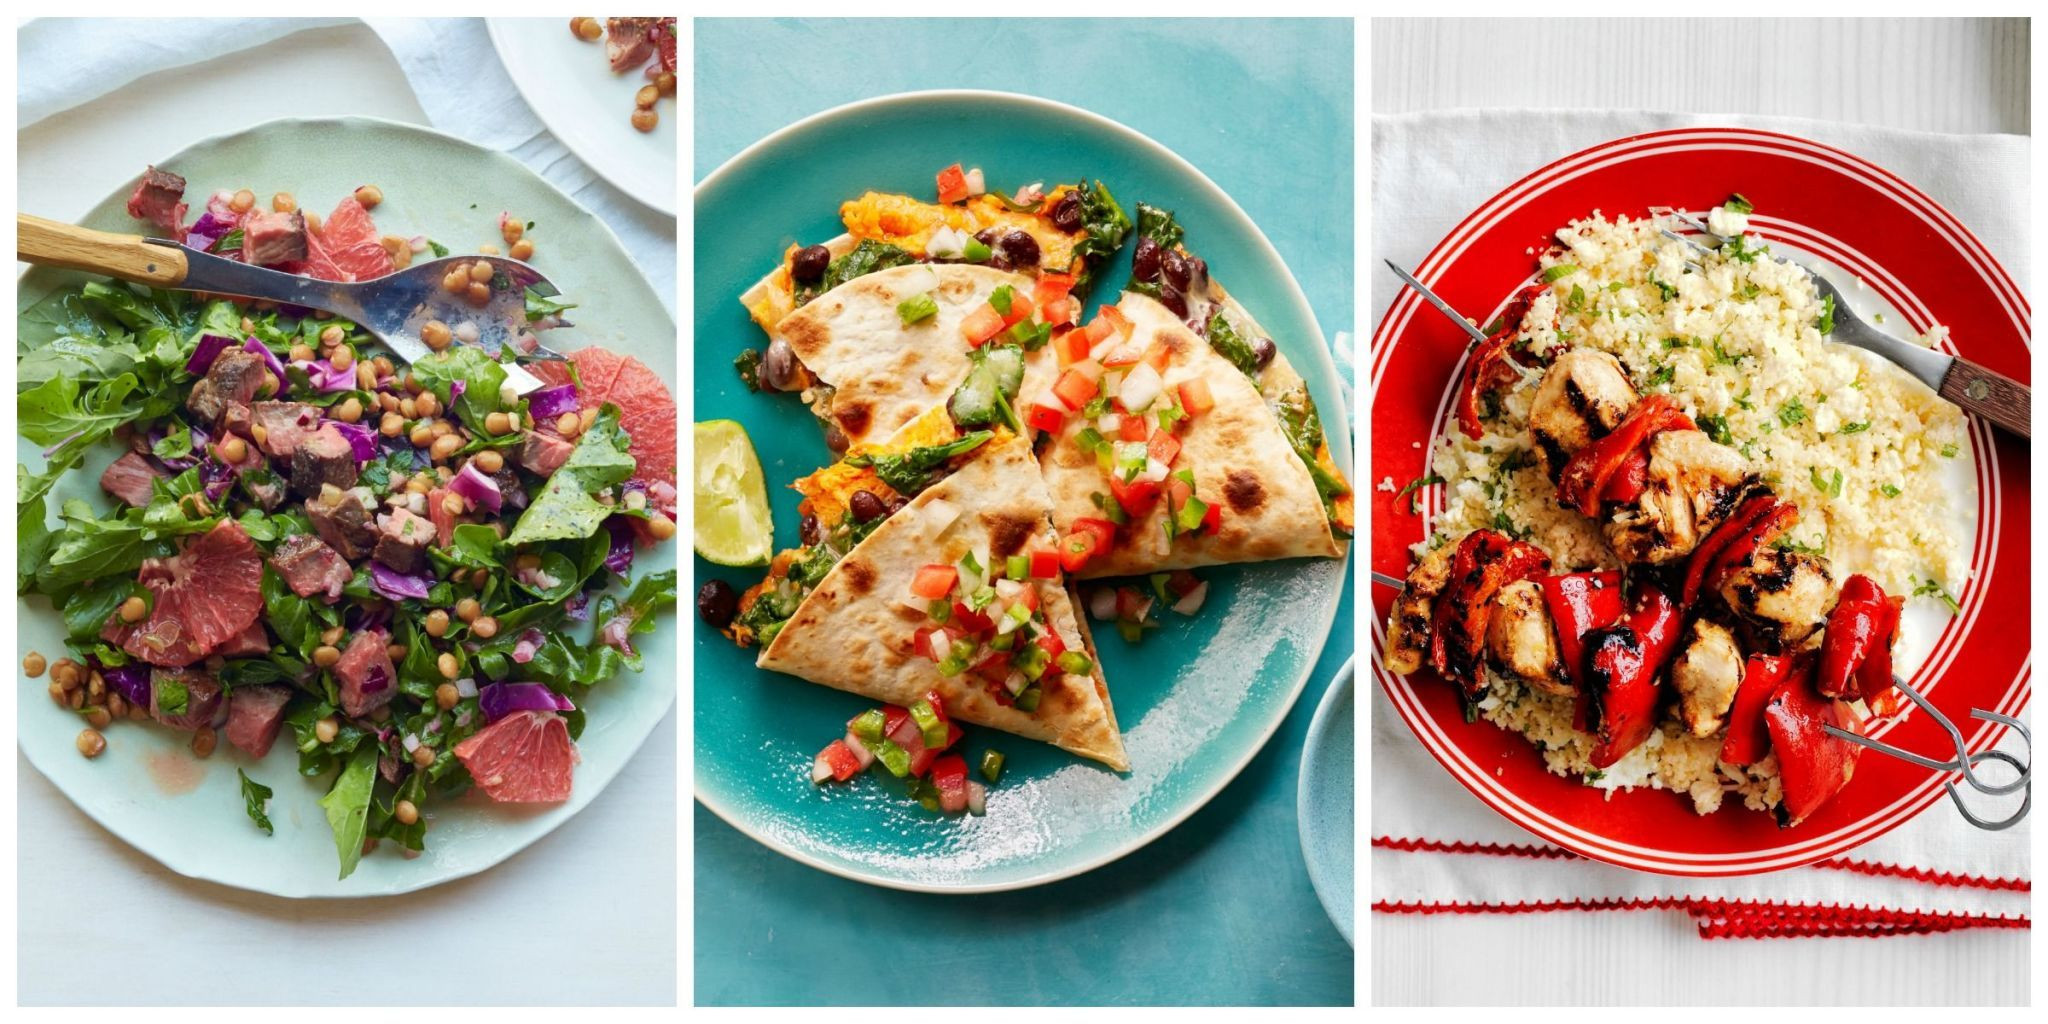 Heart Healthy Dinner Ideas  52 Heart Healthy Dinner Recipes That Don t Taste Like Diet